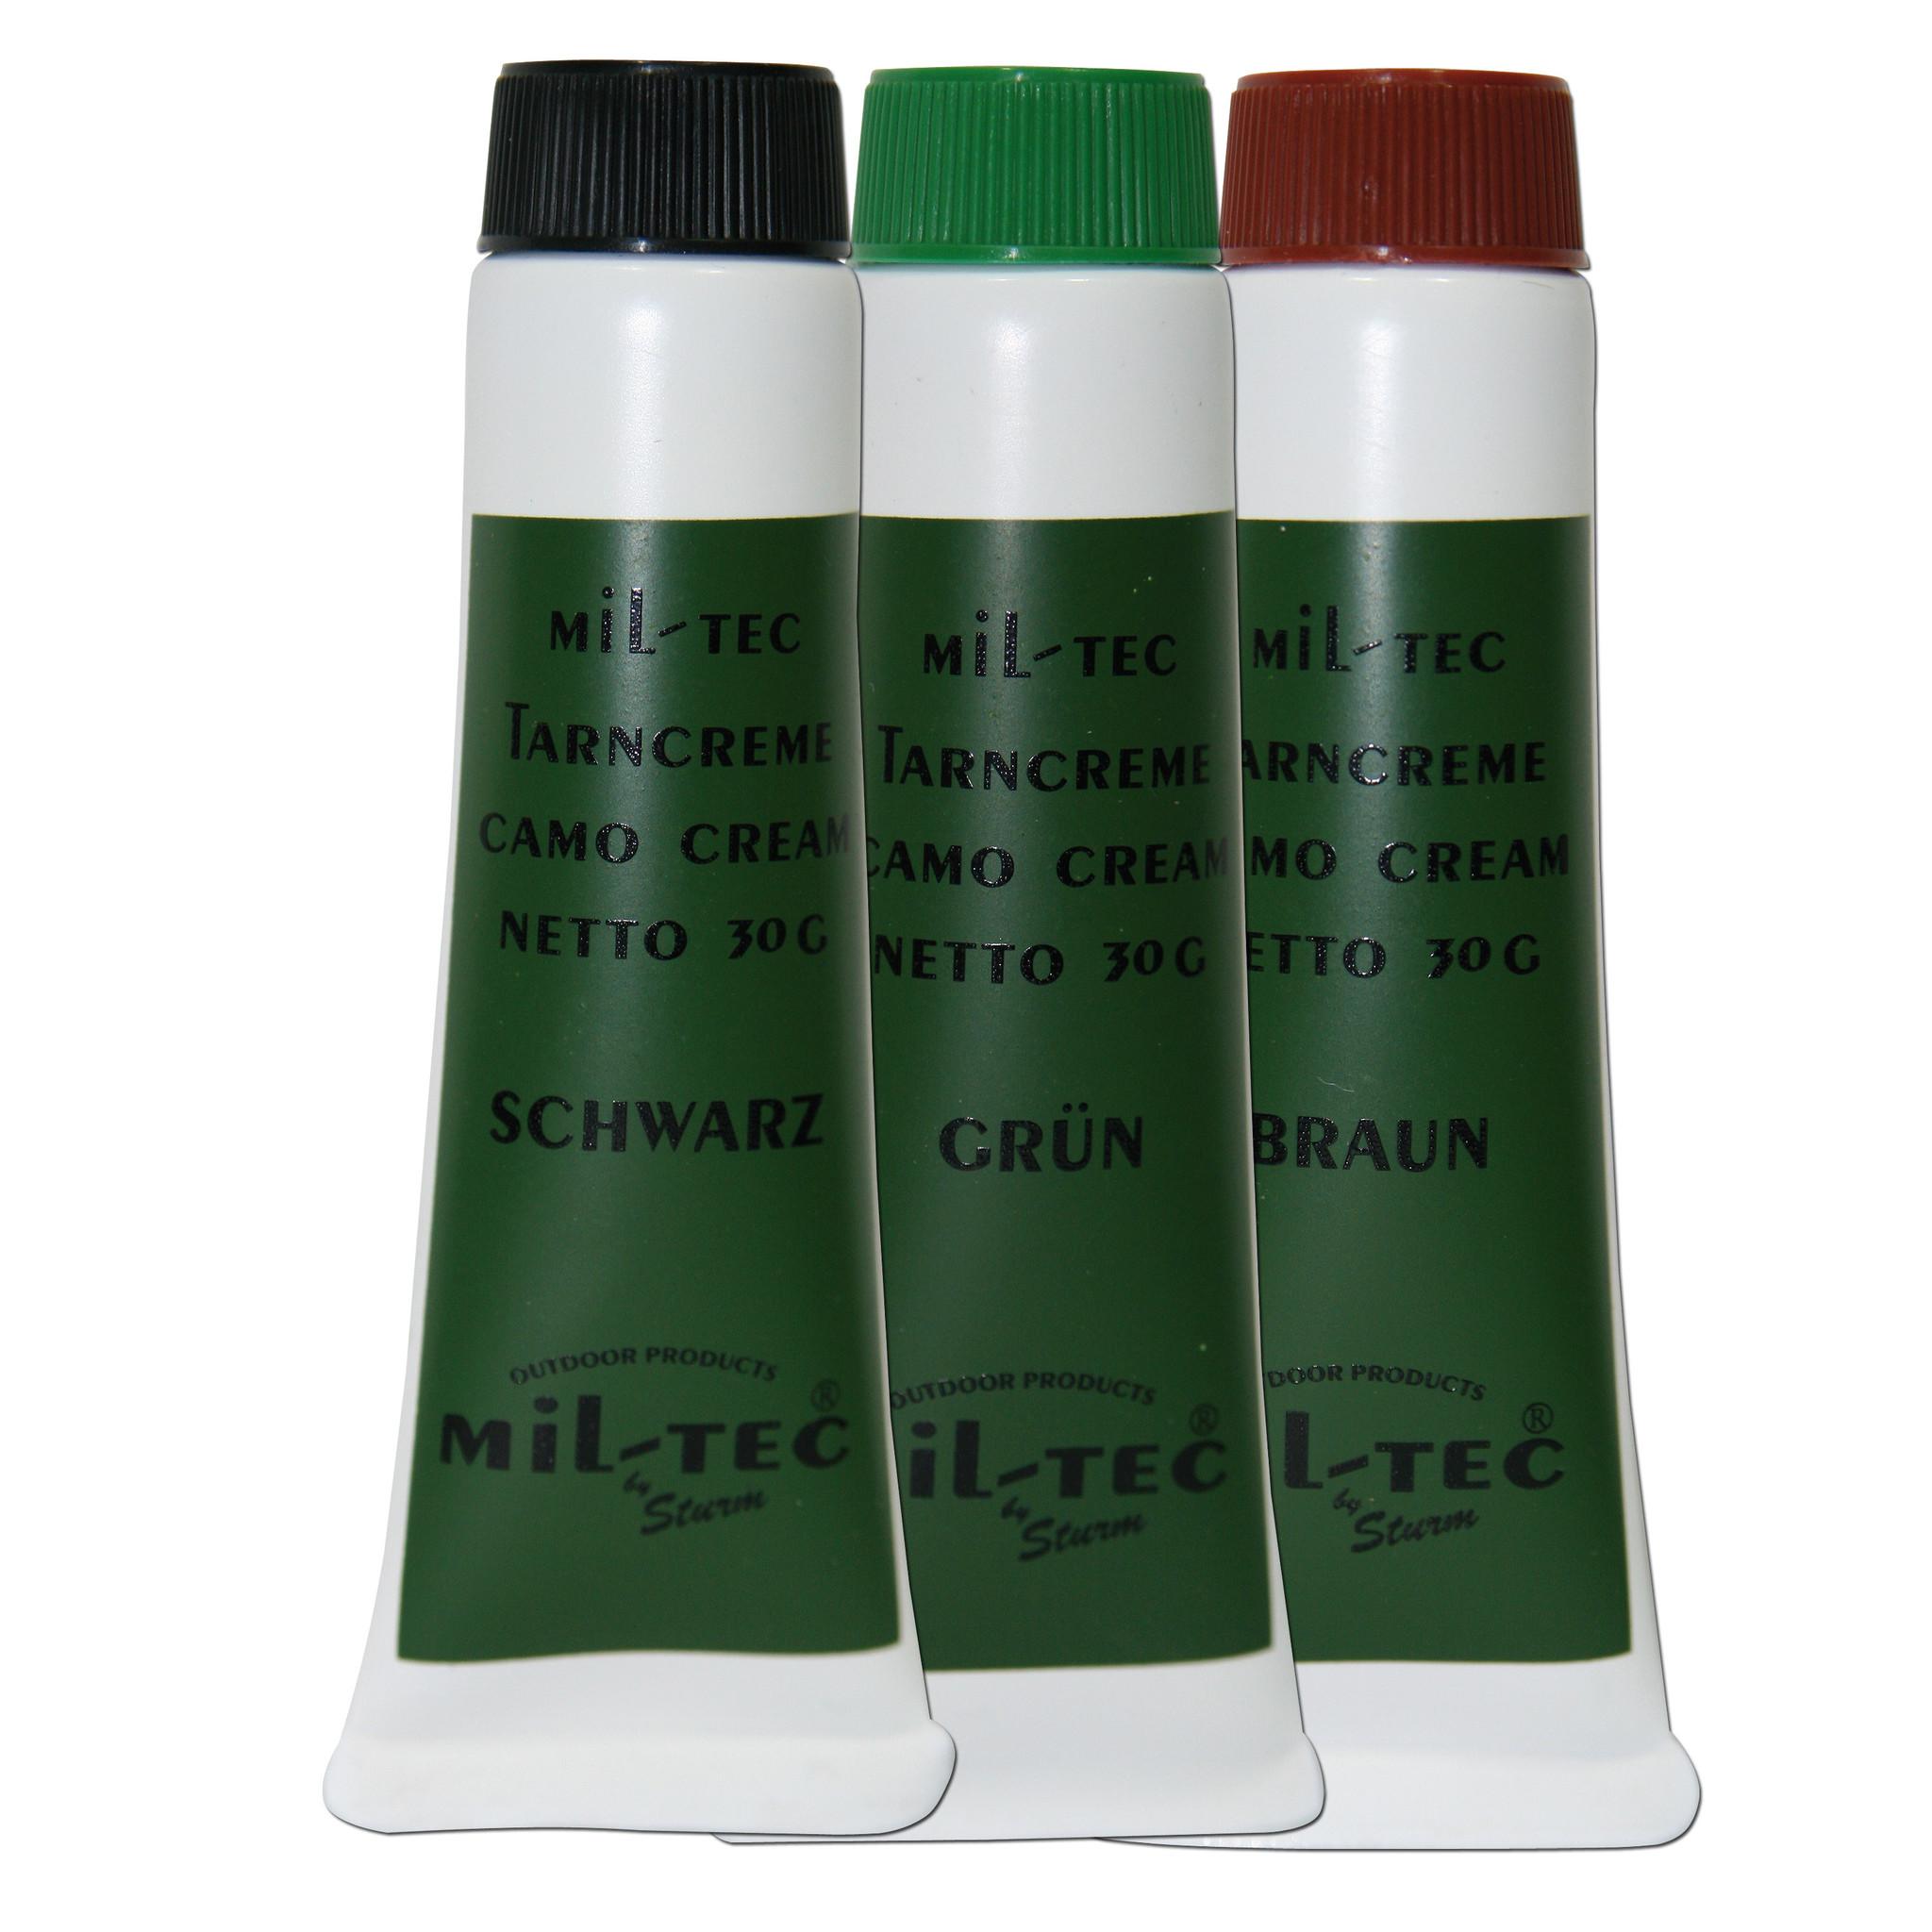 Mil-Tec Tarnfarbe Camo Face Paint Set - Grün, Braun, Schwarz